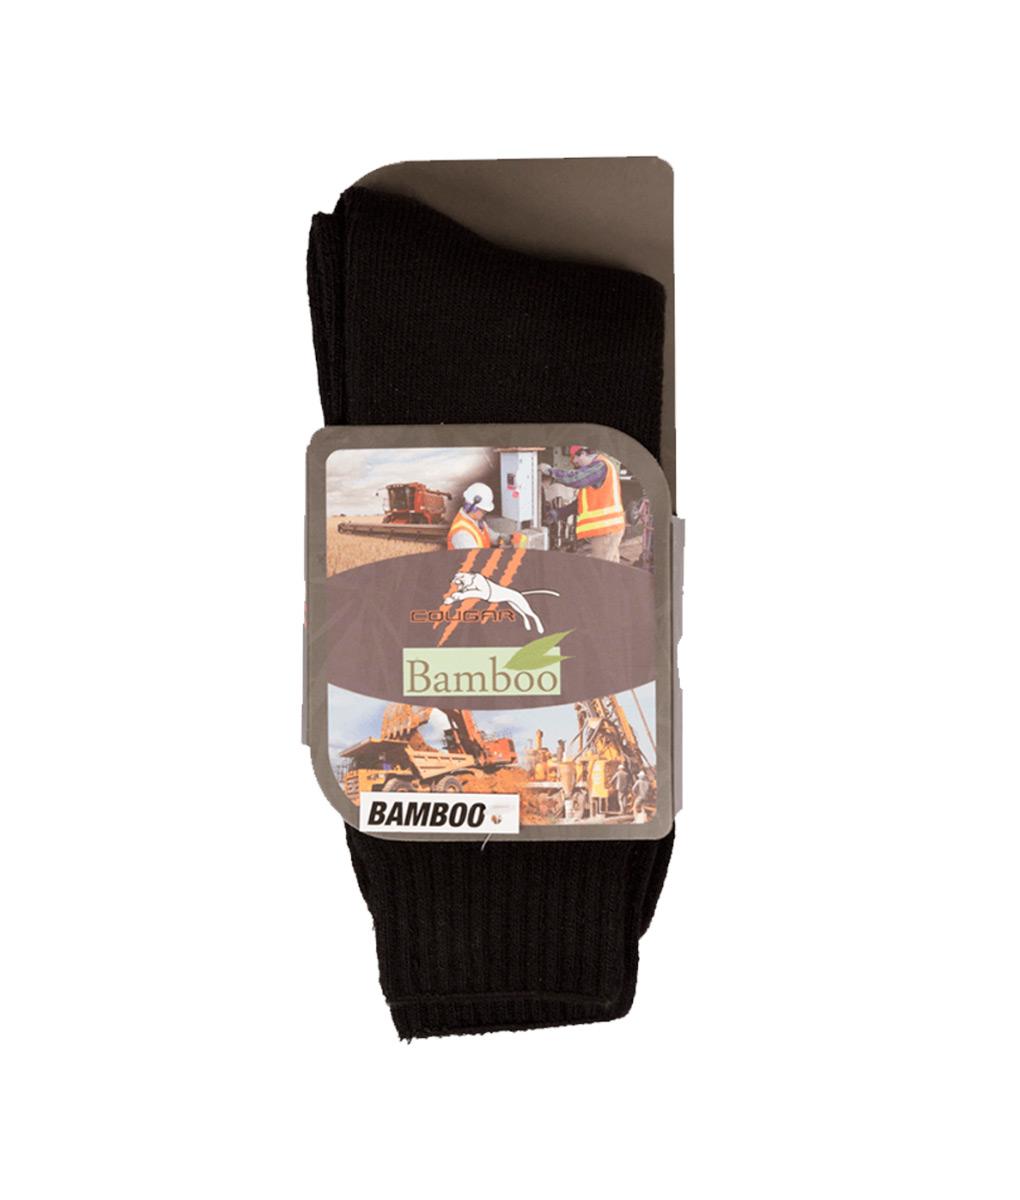 Bamboo Socks – Mens by Cougar Chef Uniforms